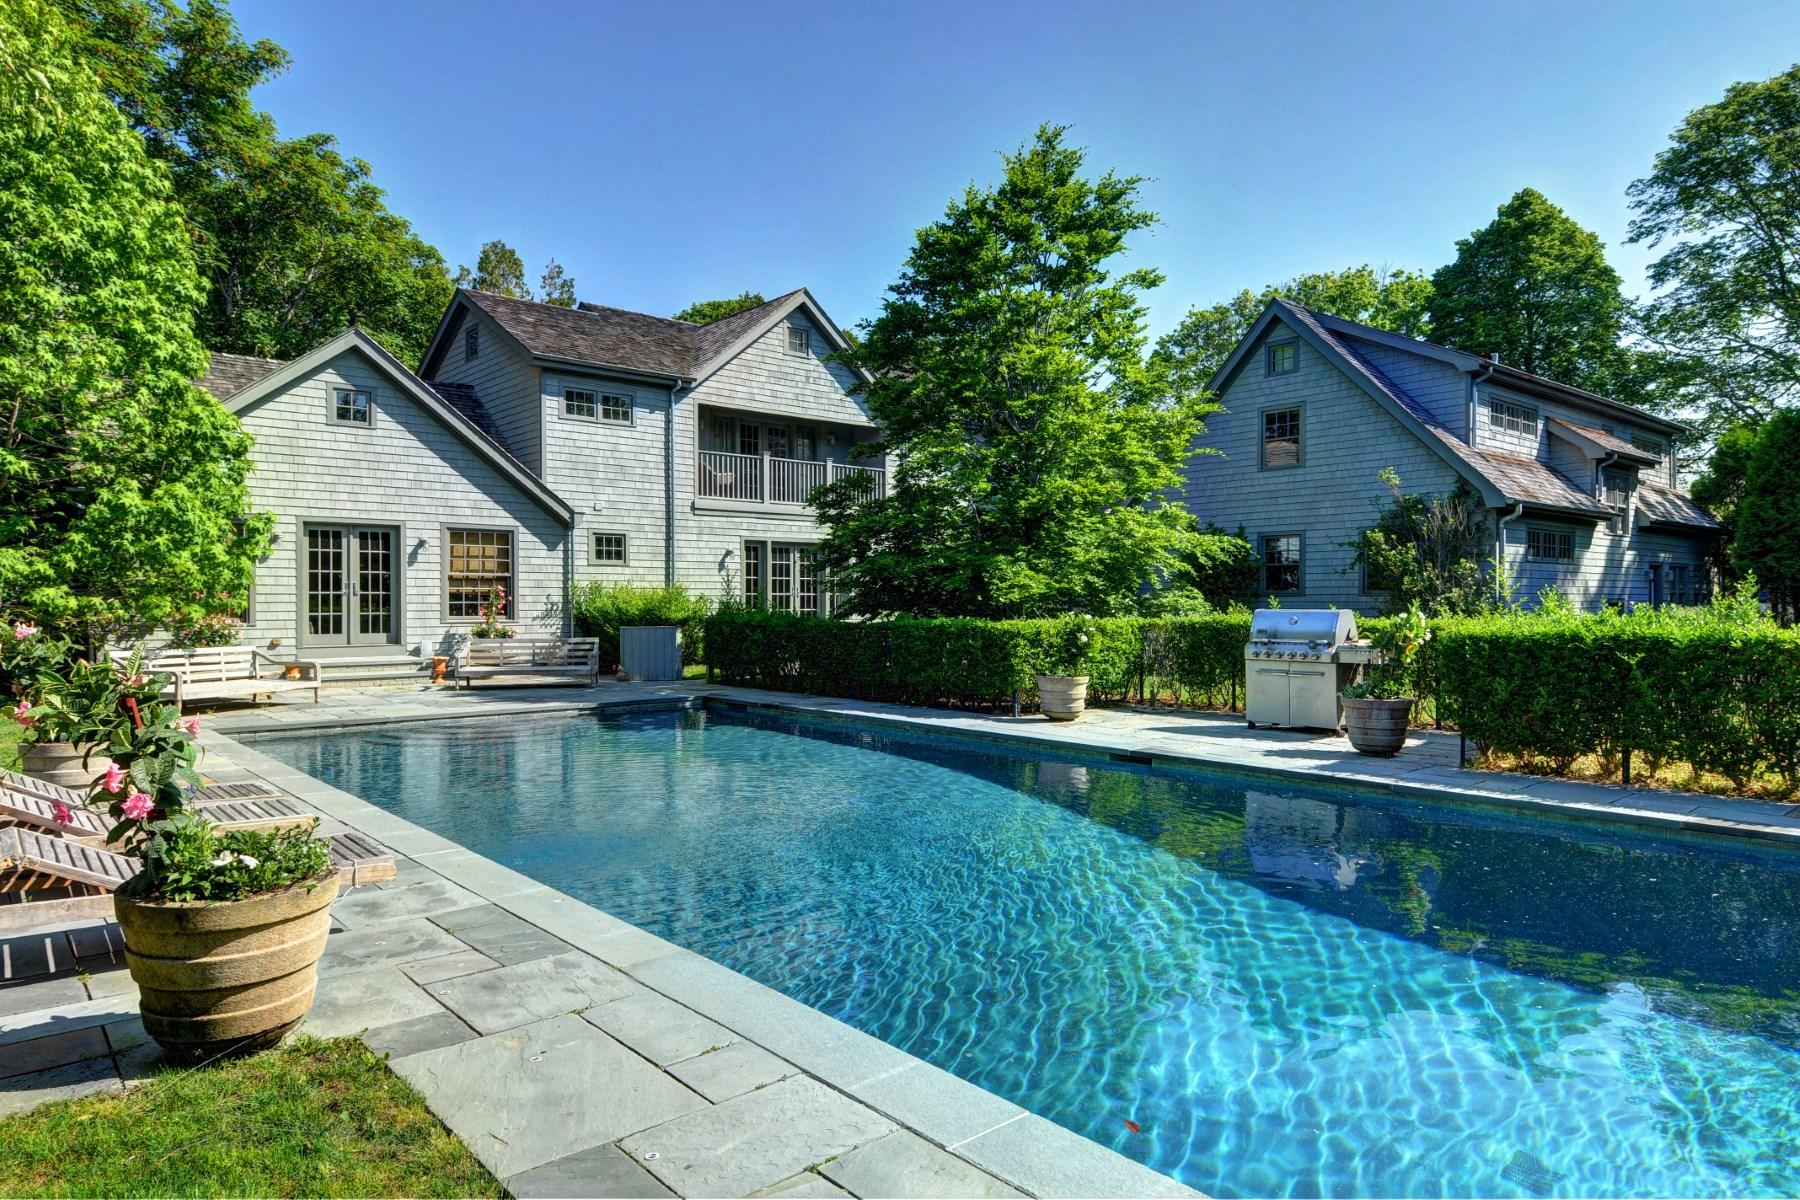 獨棟家庭住宅 為 出售 在 Amagansett Lanes 36 Hedges Lane Amagansett, 紐約州 11930 美國